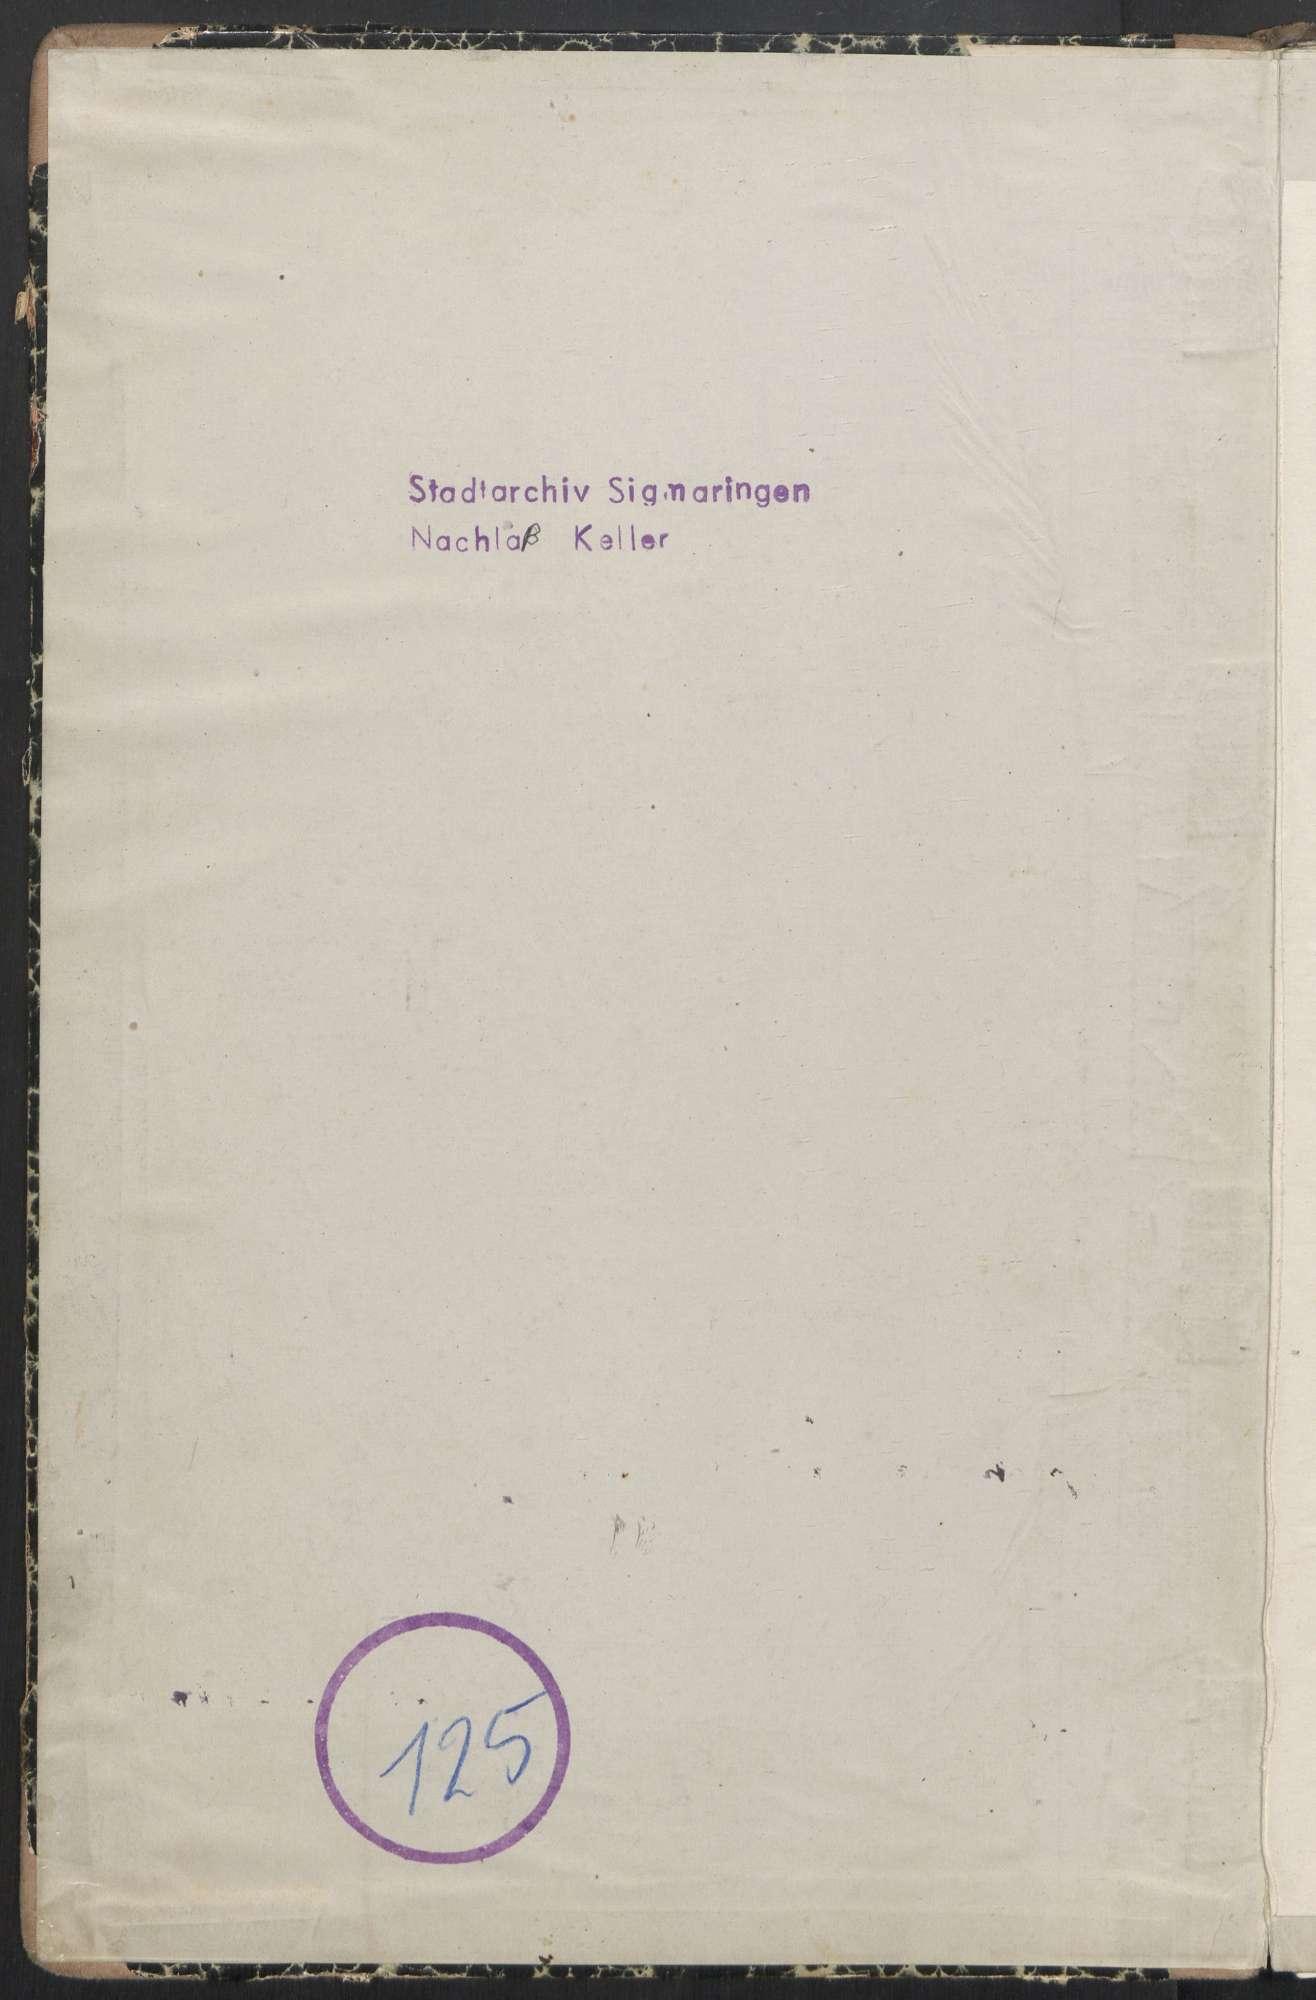 Obst- und Gartenbauverein e.V. (1912 - 1937), Bild 2